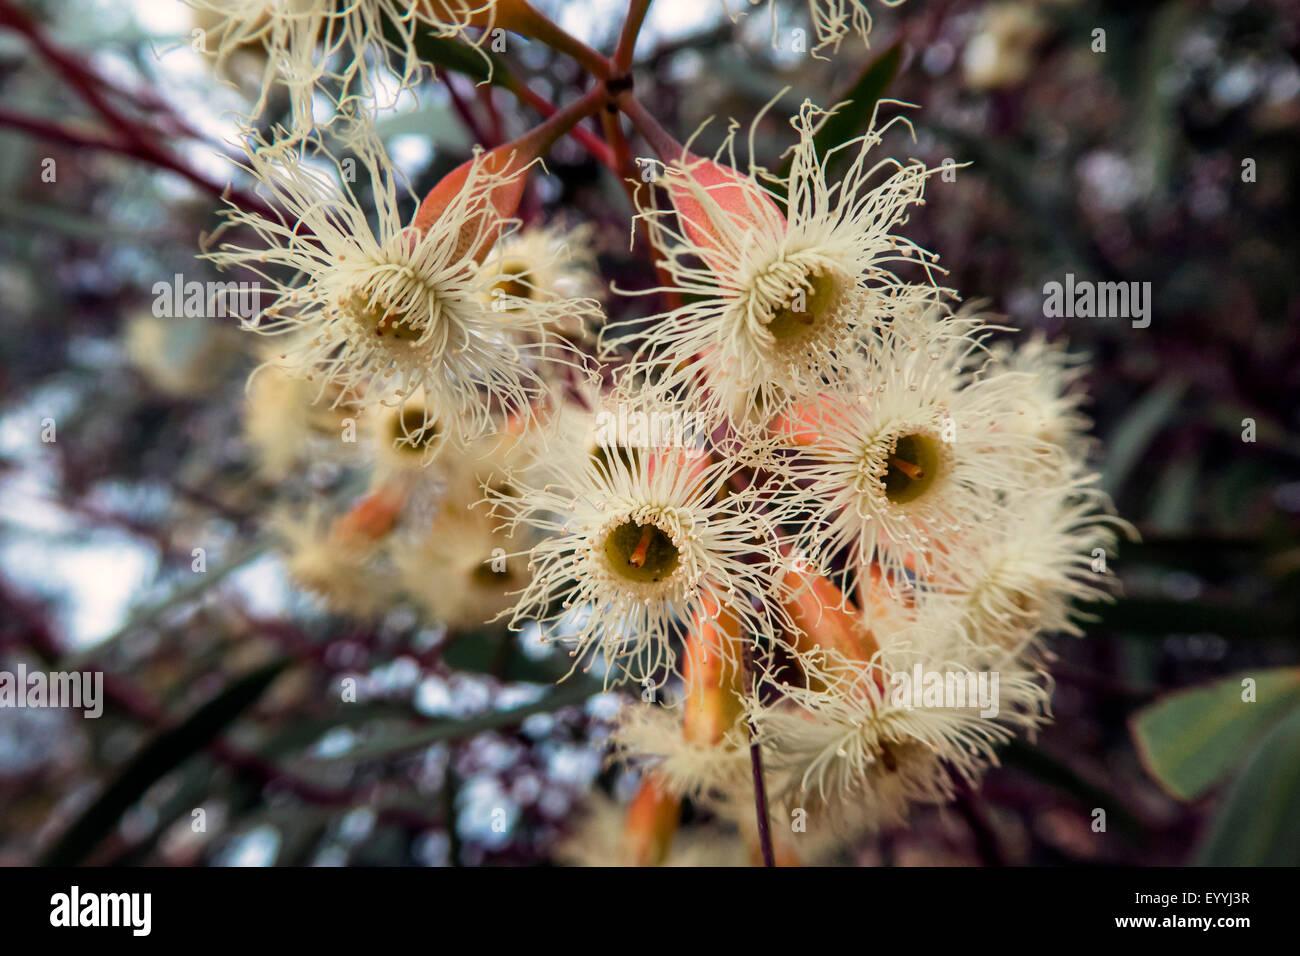 Snow Gum (Eucalyptus pauciflora), flowers, Australia, Western Australia - Stock Image